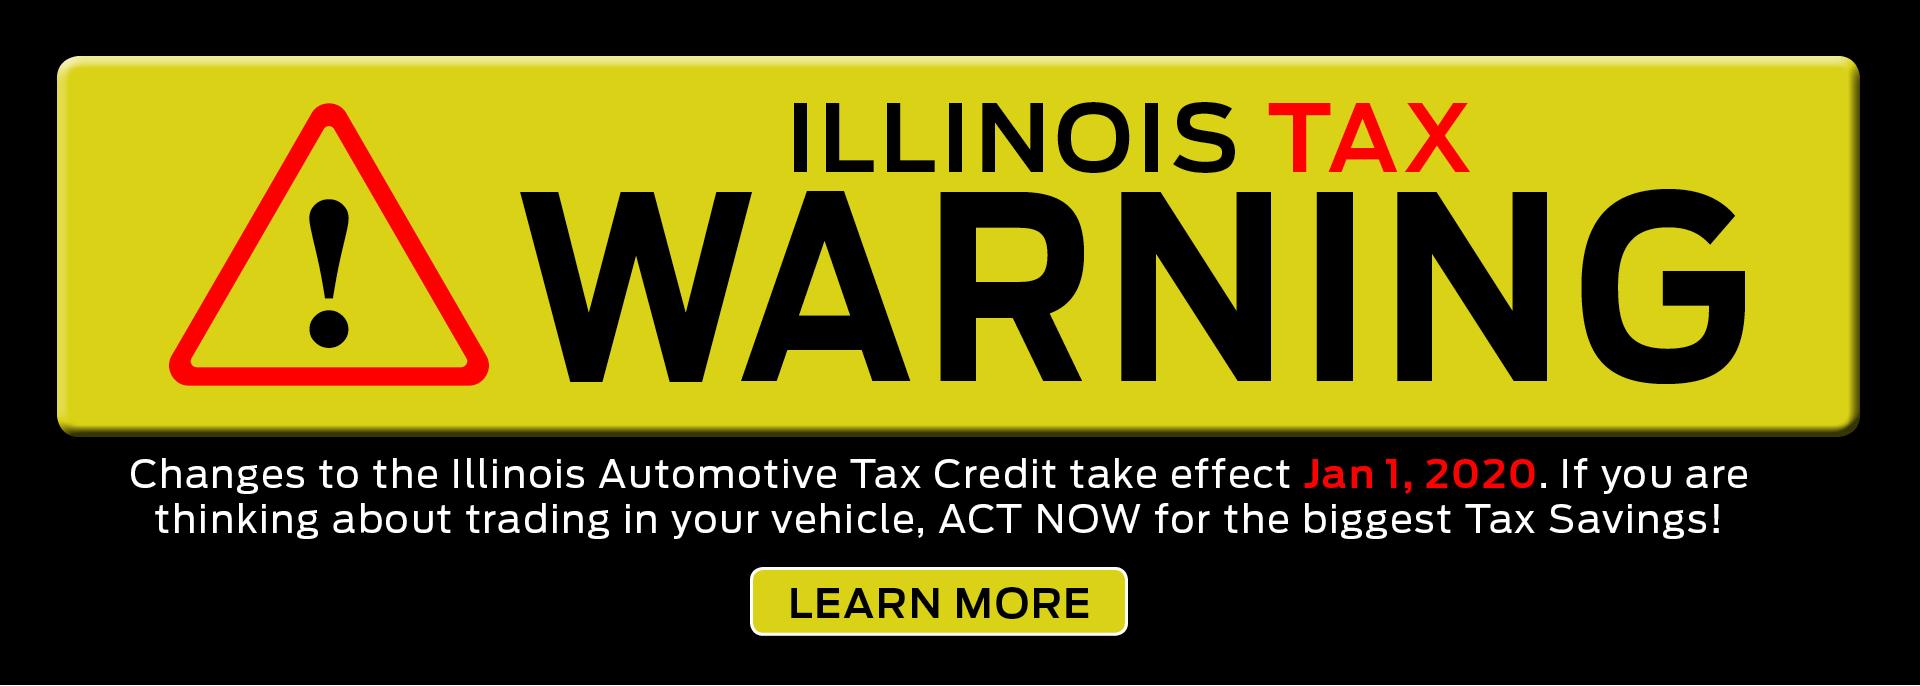 Roe Ford Tax Warning Nov 1920x686